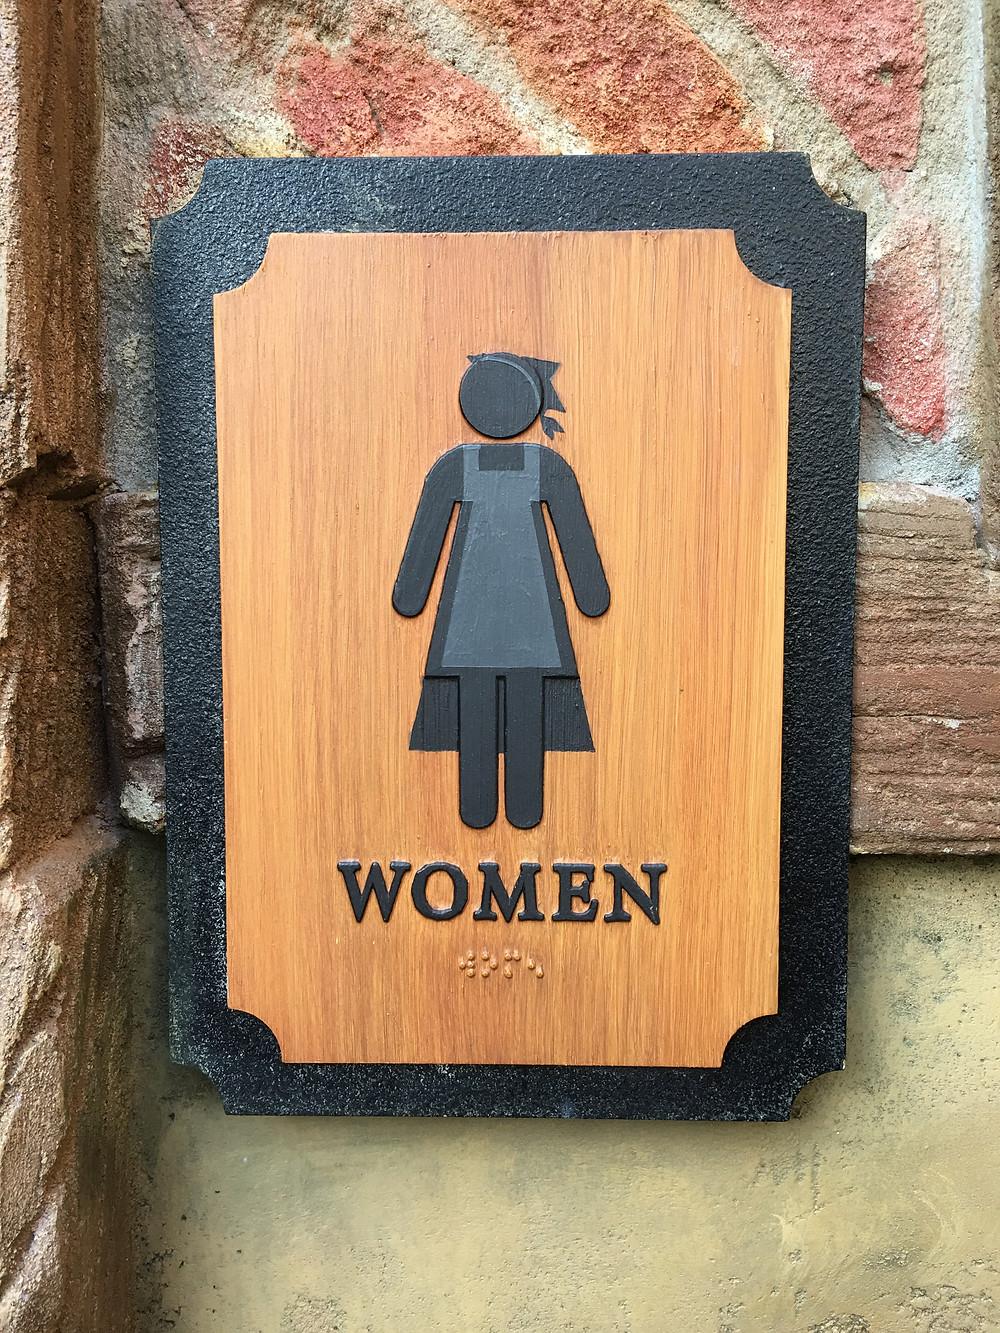 Women's Room Sign, Gaston's Tavern Loo, Magic Kingdom